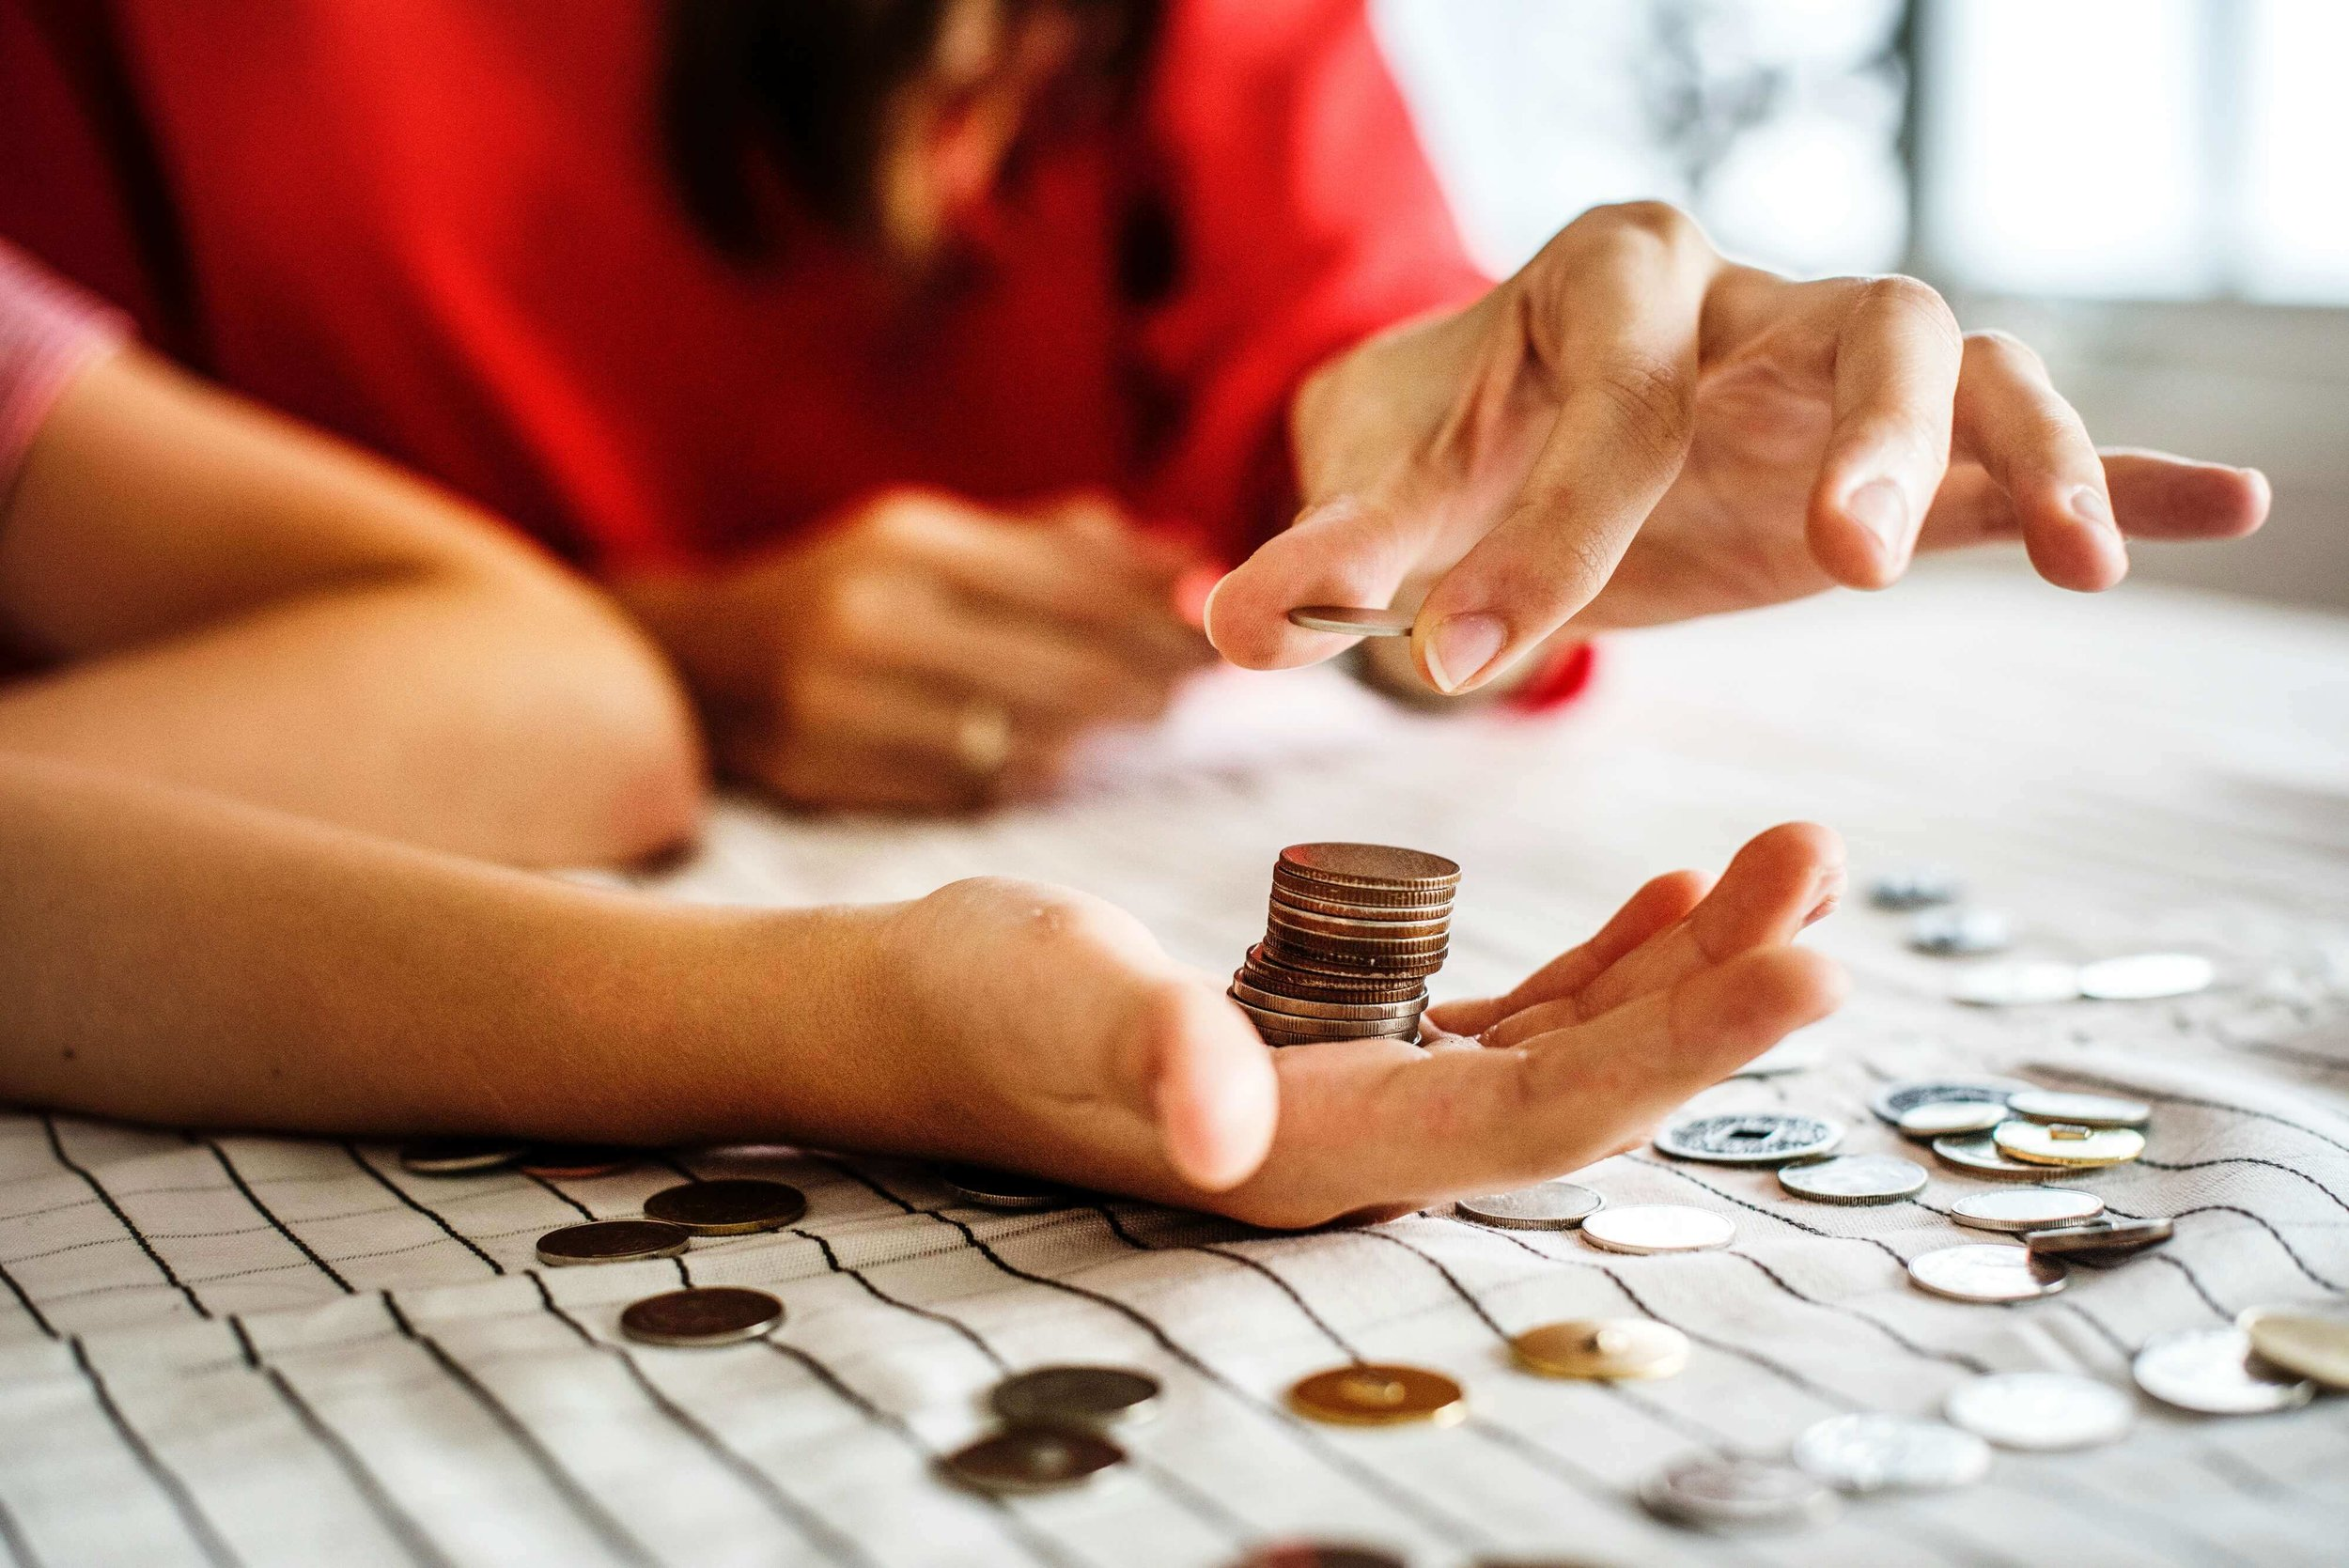 hatch-tribe-money-savings-business-entrepreneurship-women-banking3-2.jpg